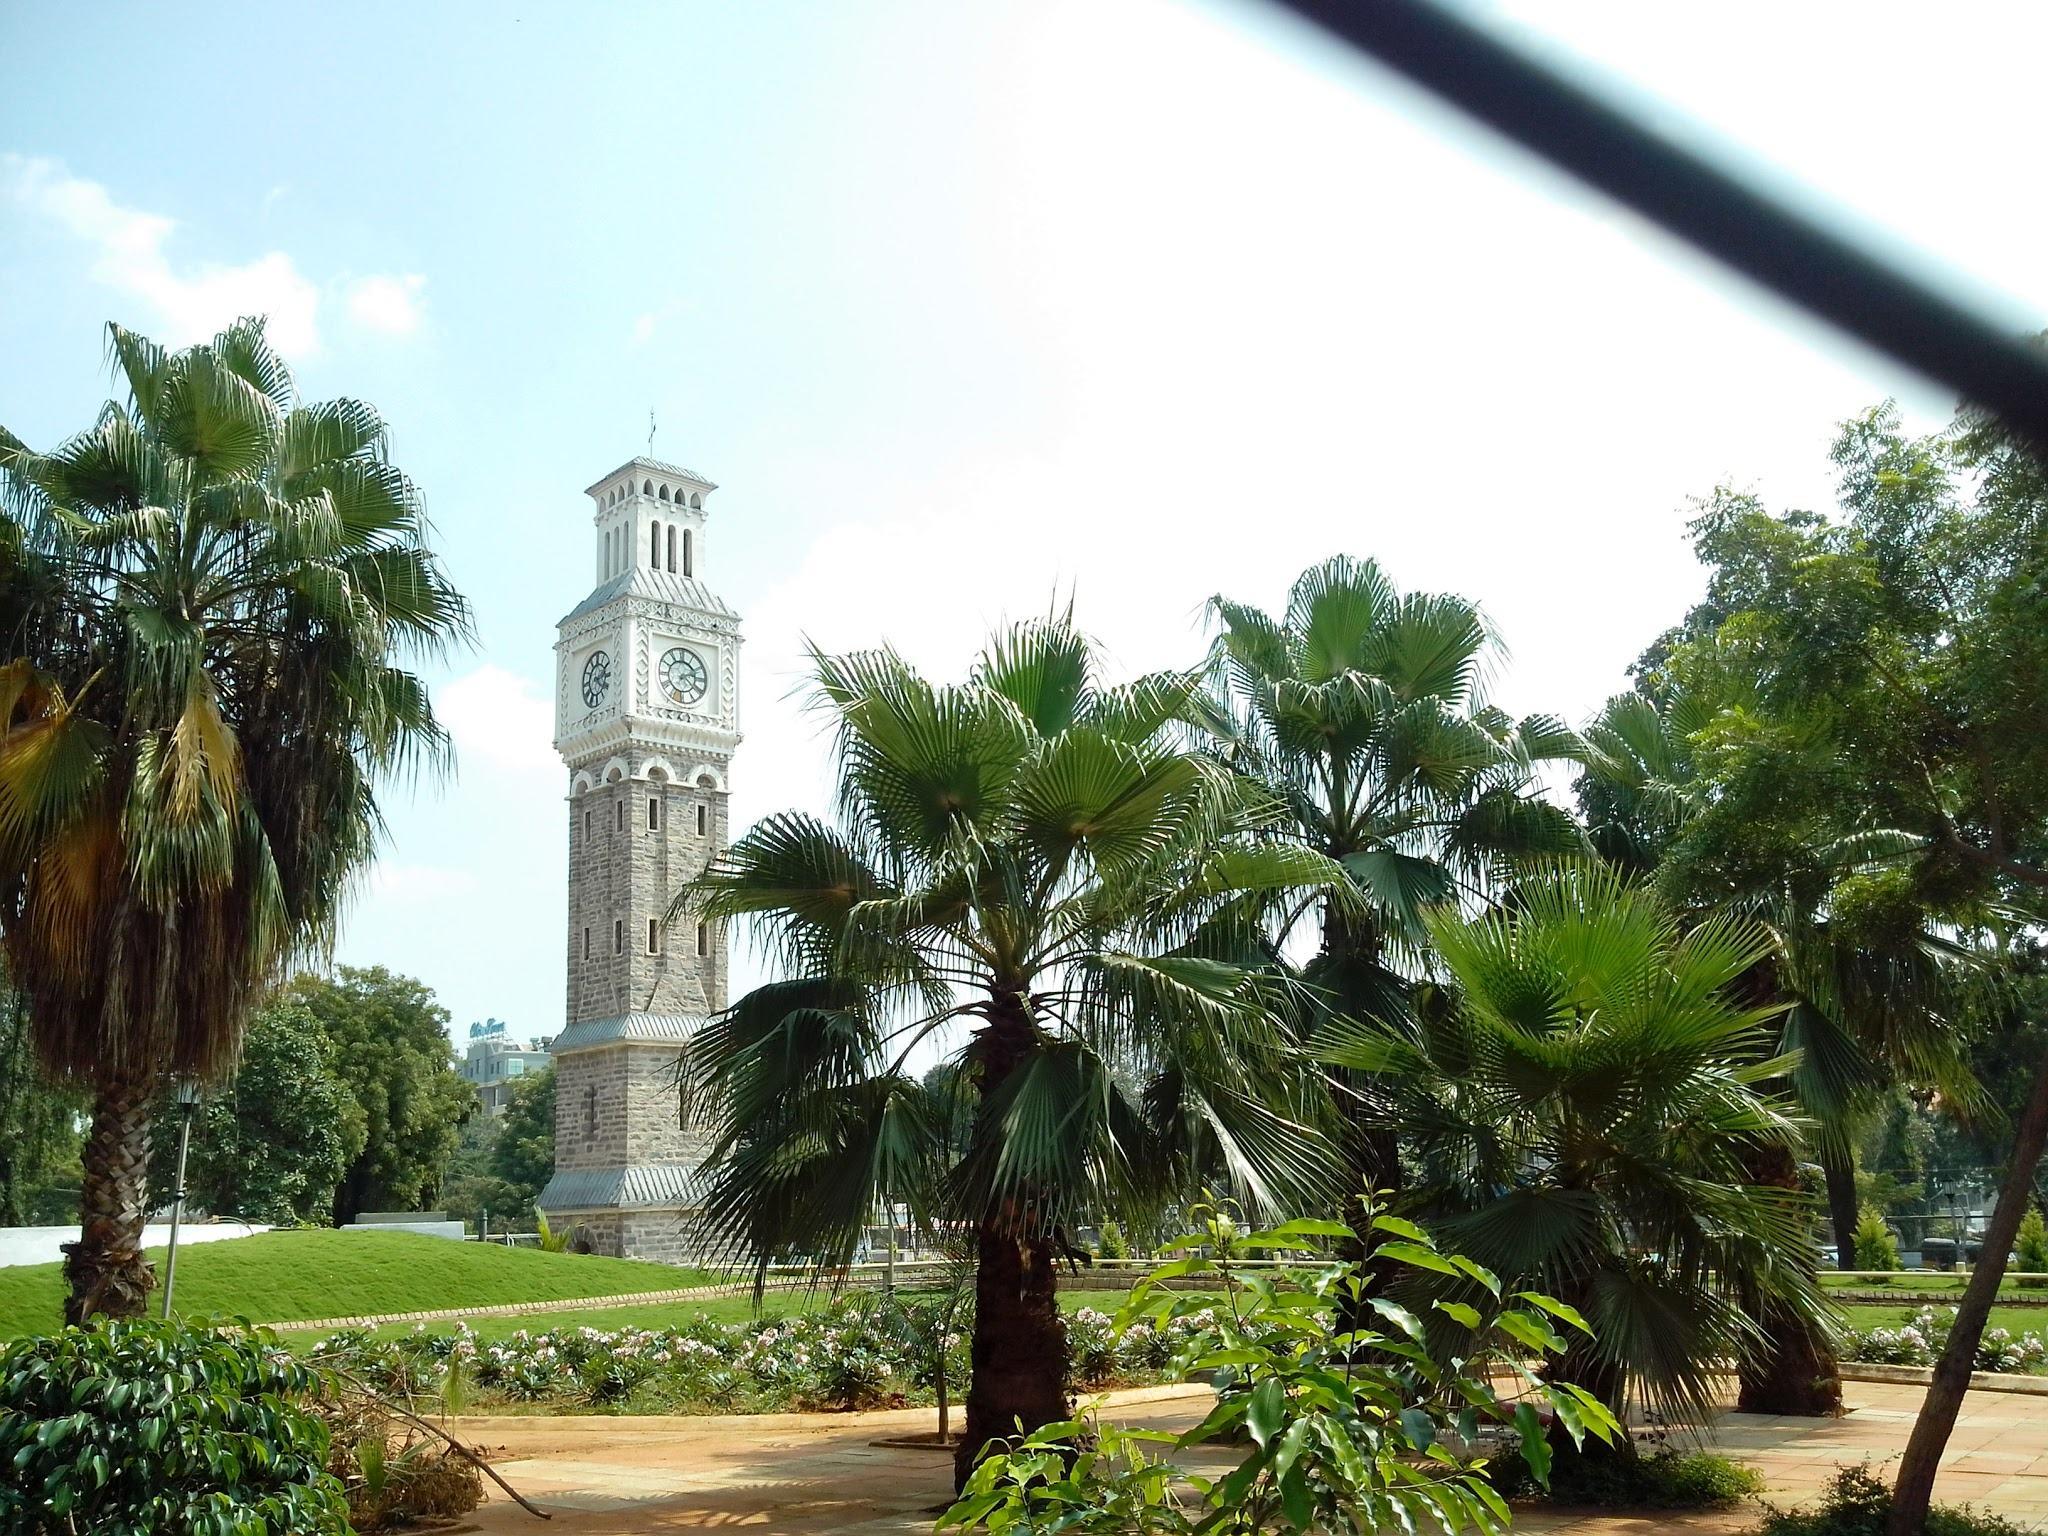 *** Сайт www.india.ved.bz запущен в работу в июне 2011 года ***